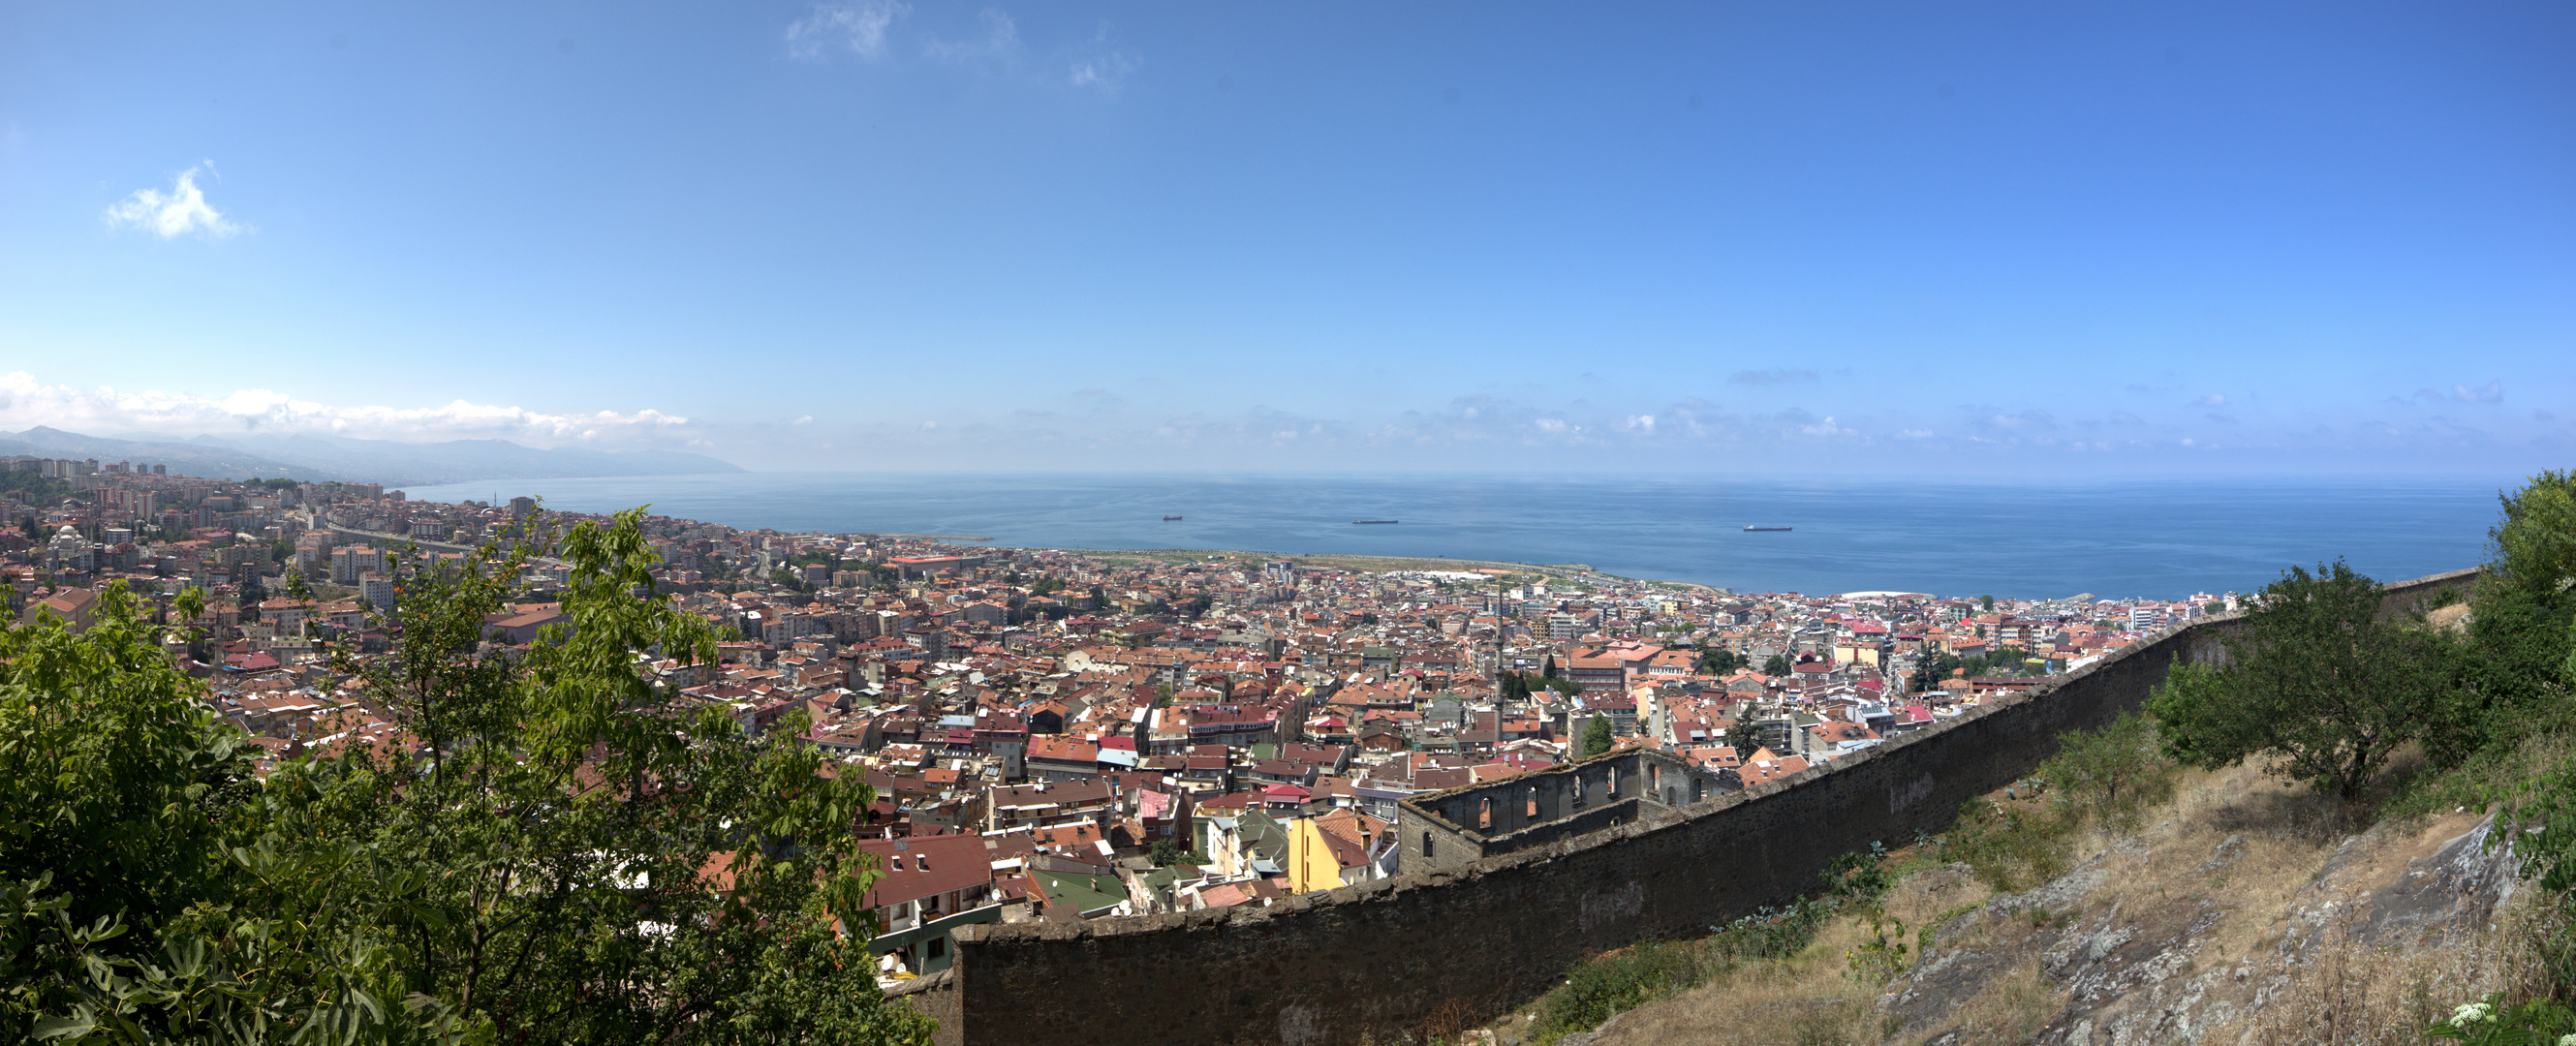 Boztepe - Trabzon Panorama